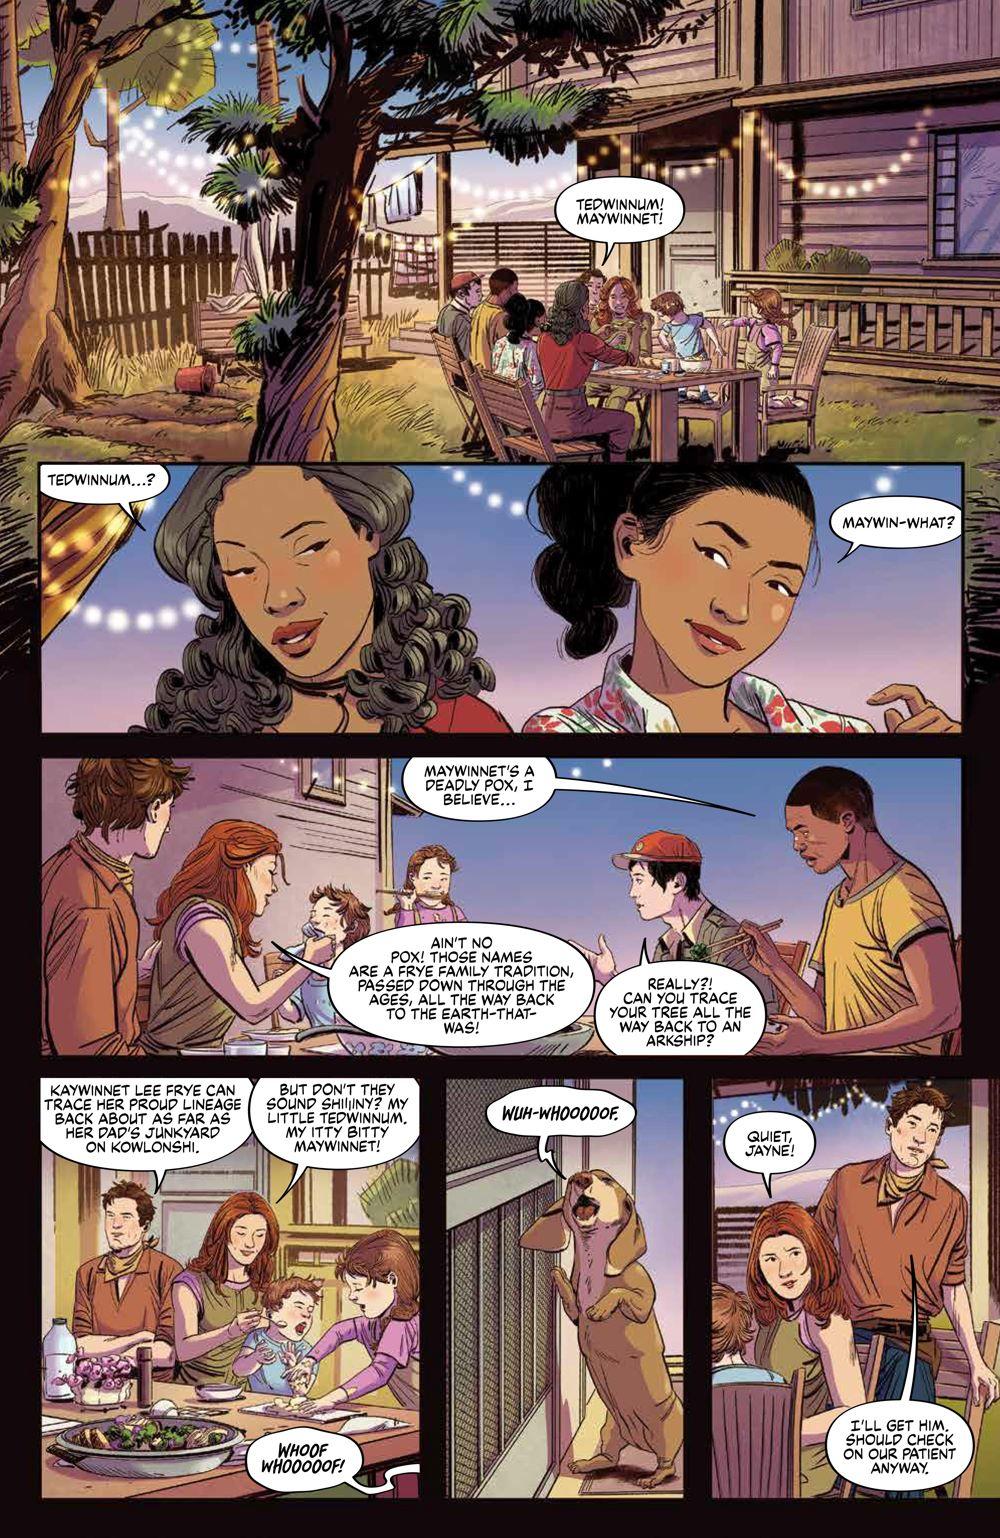 Firefly_BrandNewVerse_003_PRESS_5 ComicList Previews: FIREFLY A BRAND NEW 'VERSE #3 (OF 6)